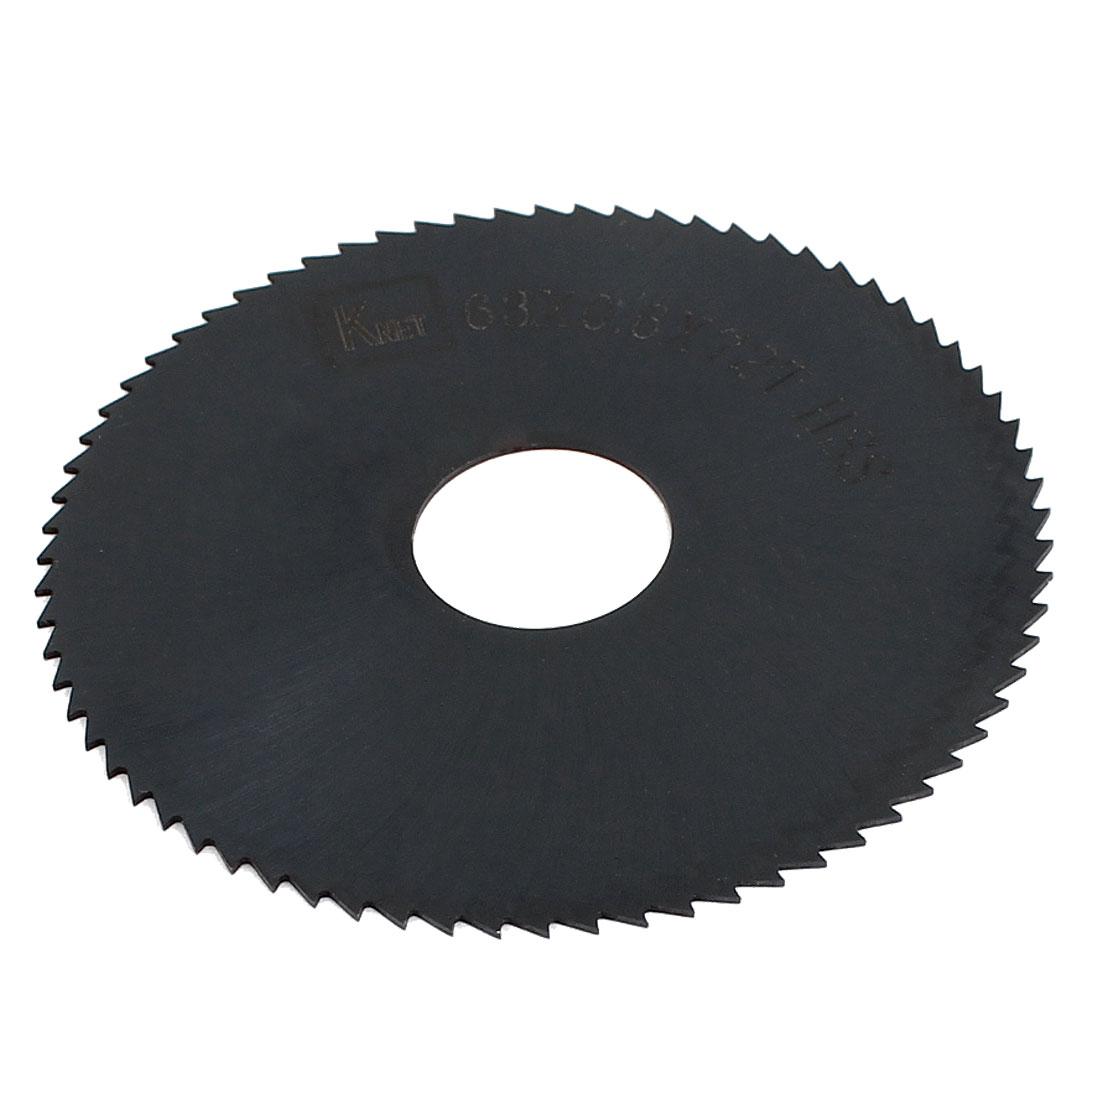 HSS 72 Teeth 63mm x 0.6mm x 16mm Slitting Saw Black